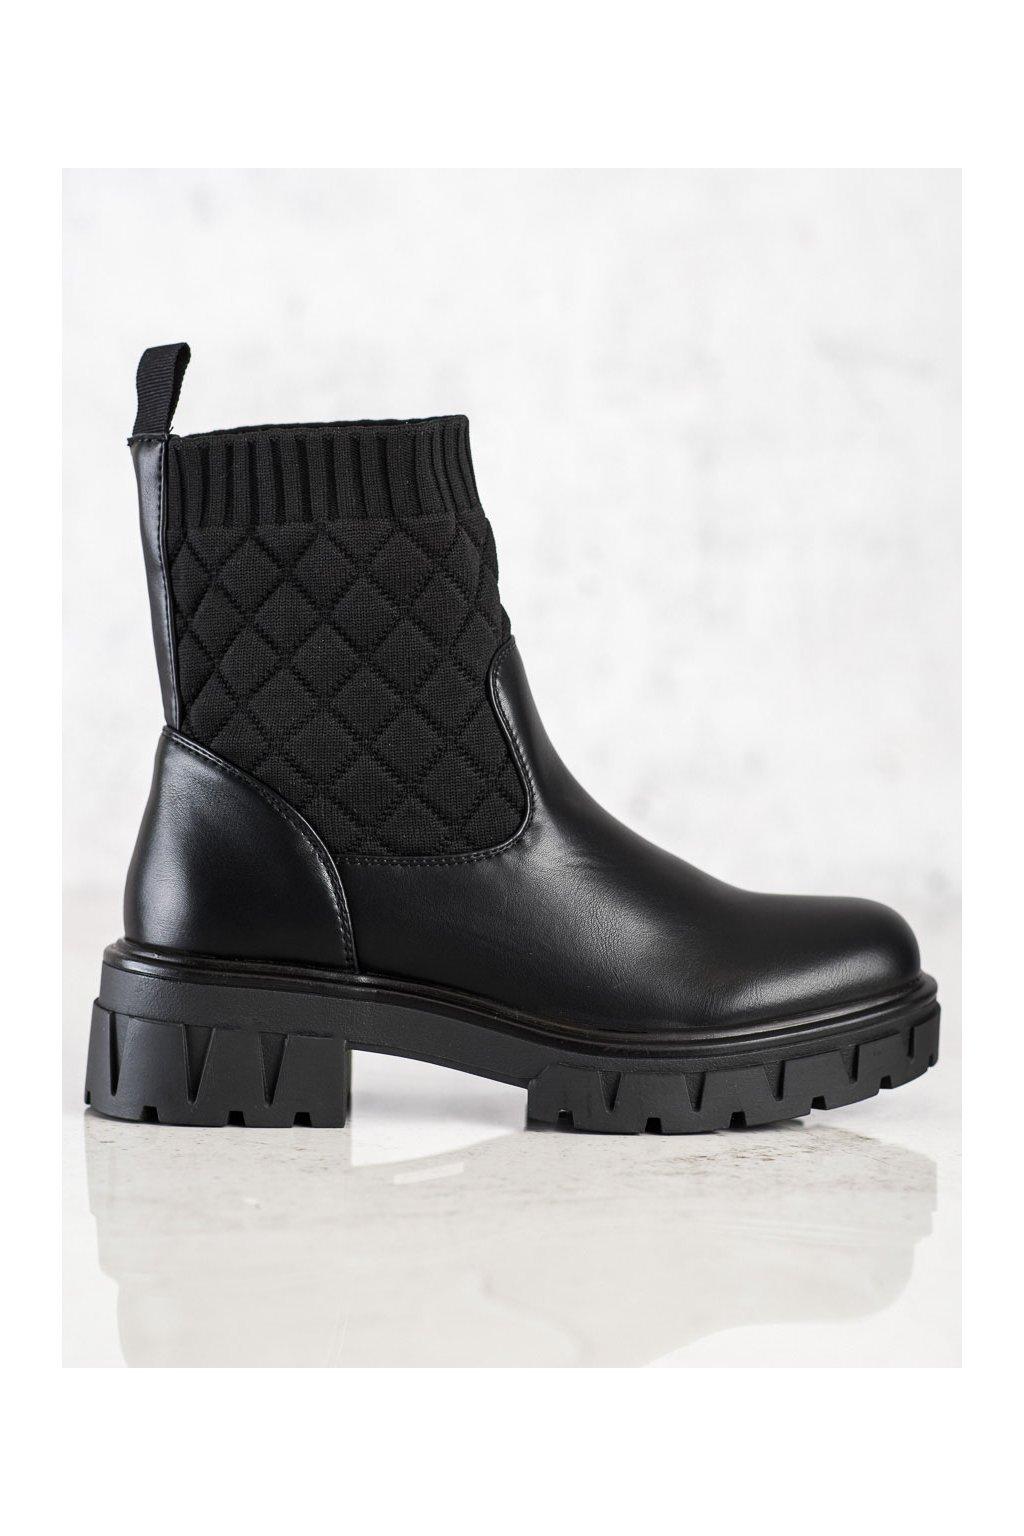 Čierne dámske topánky Seastar kod DA73B